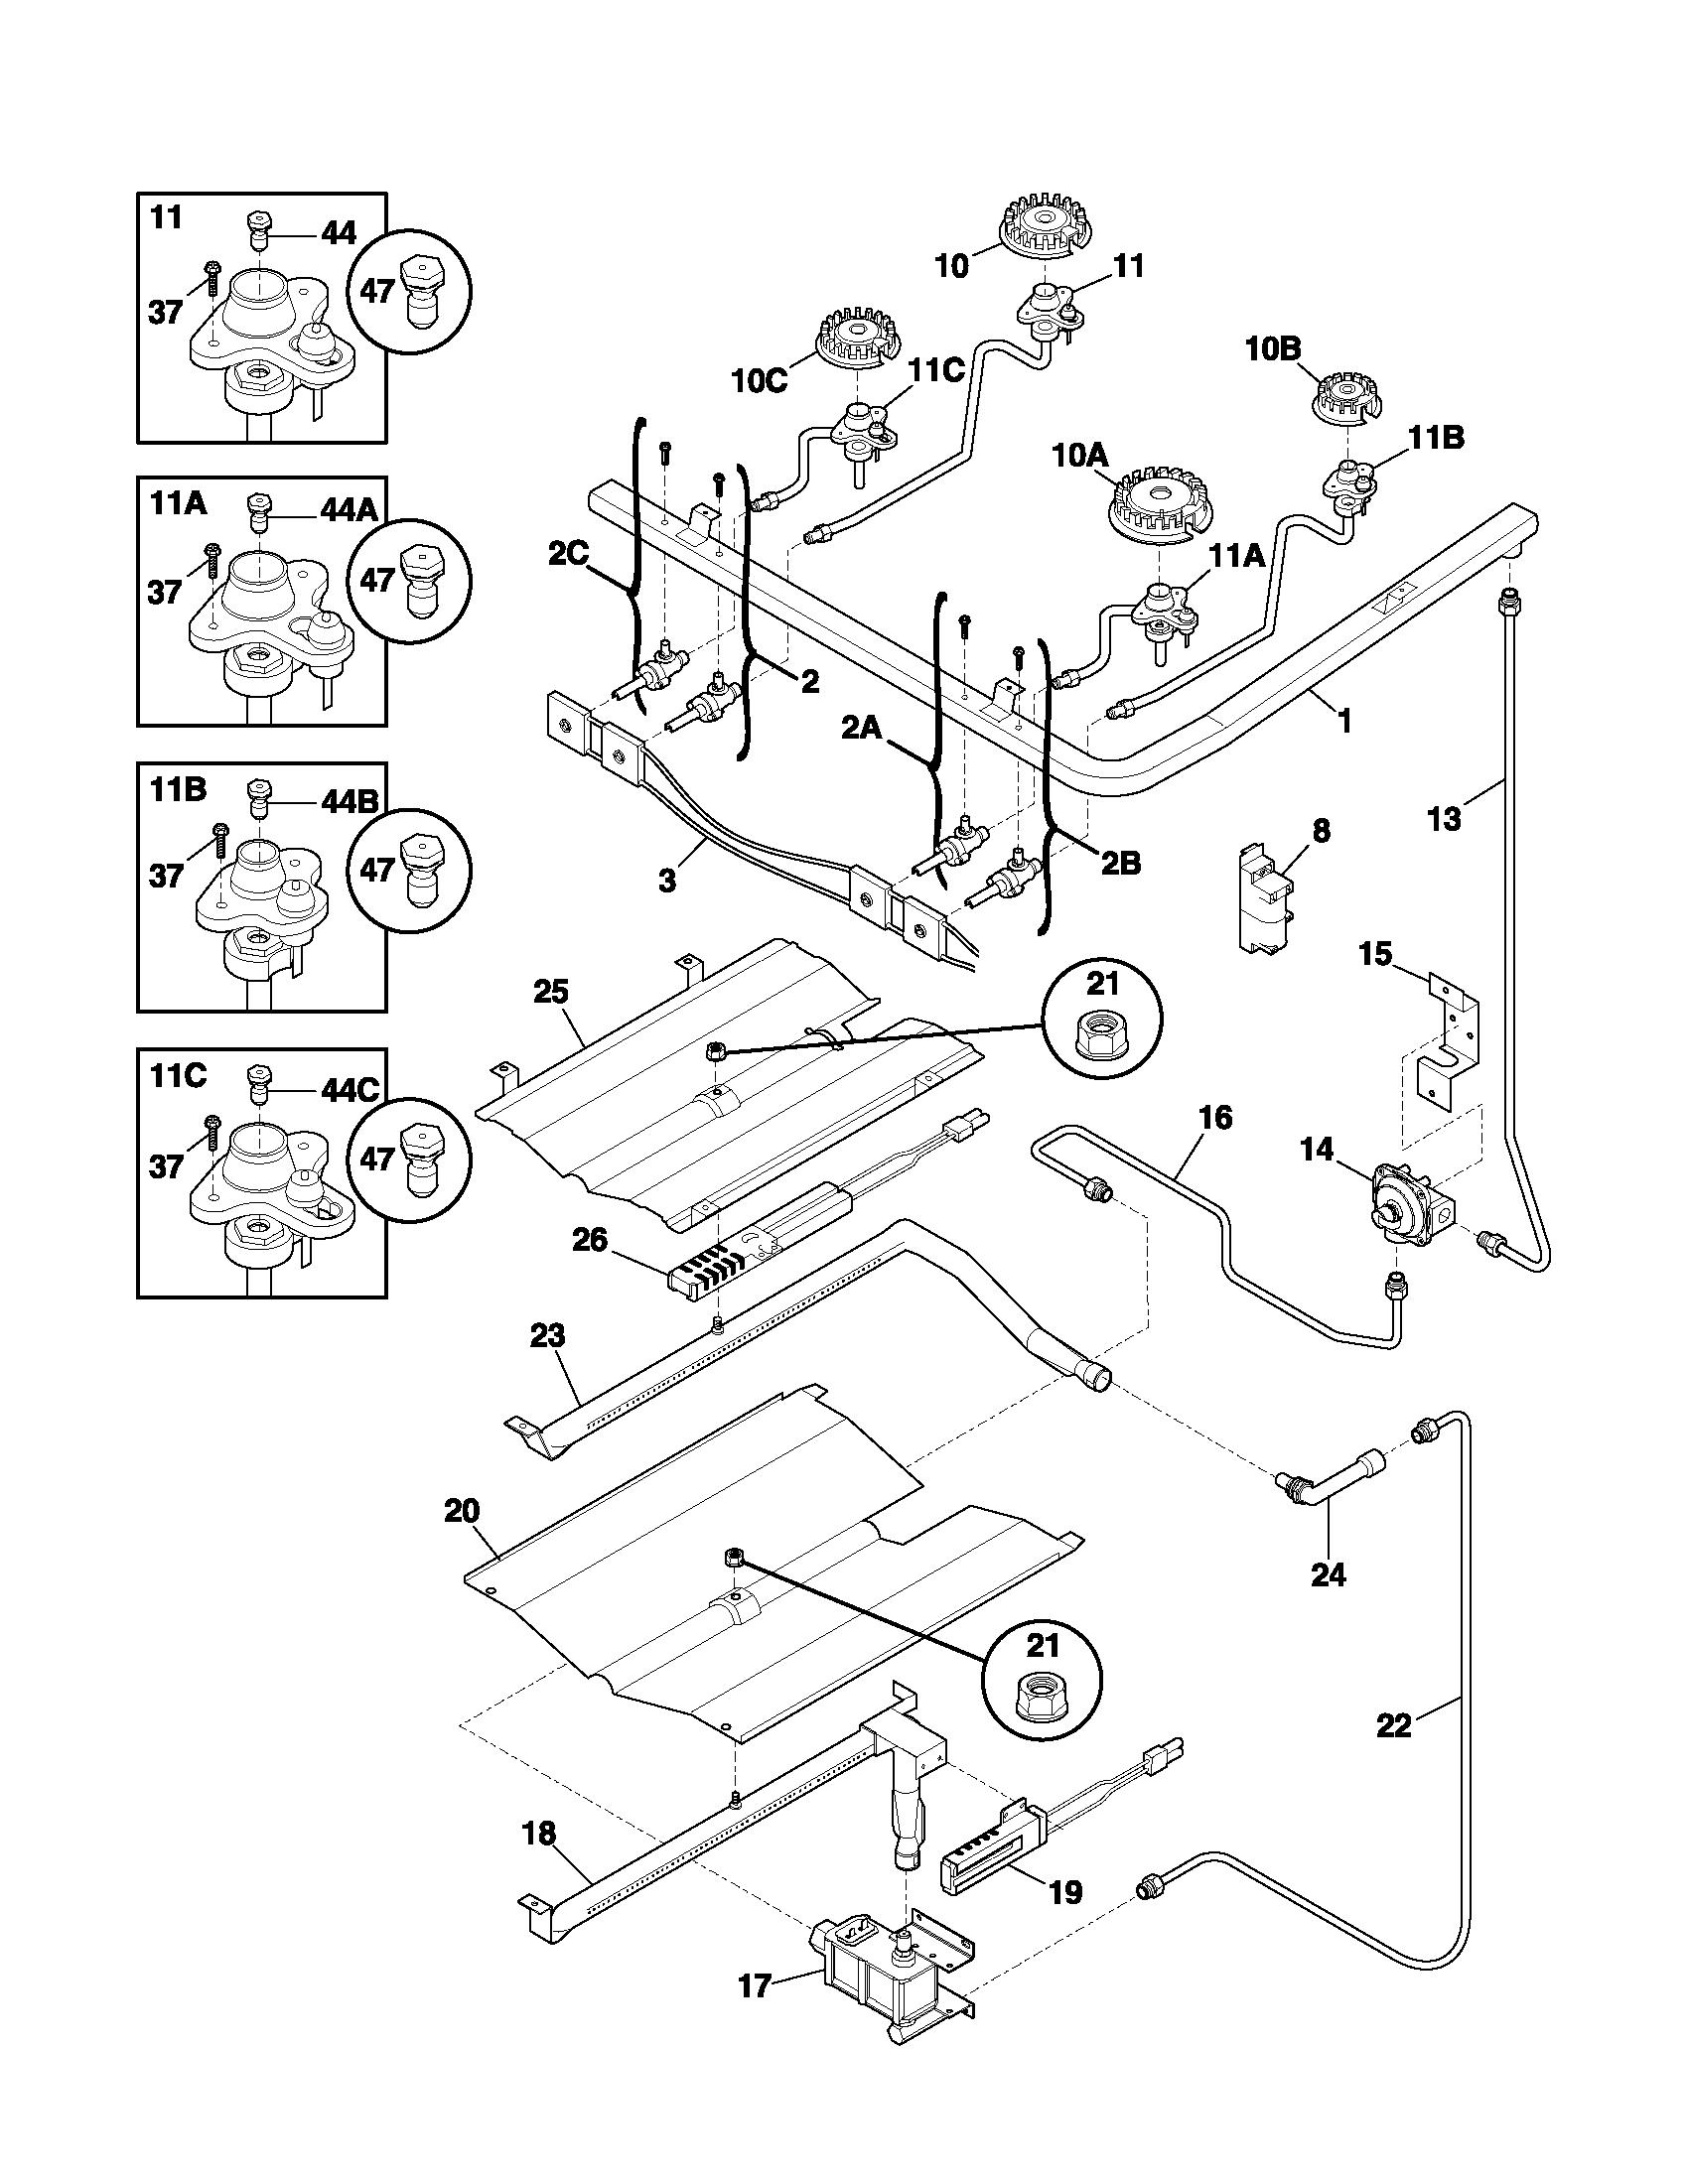 AA_8109] Plgf389Ccb Gas Range Wiring Diagram Parts Diagram Wiring DiagramOxyt Tomy Itive Kumb Sequ Phae Mohammedshrine Librar Wiring 101